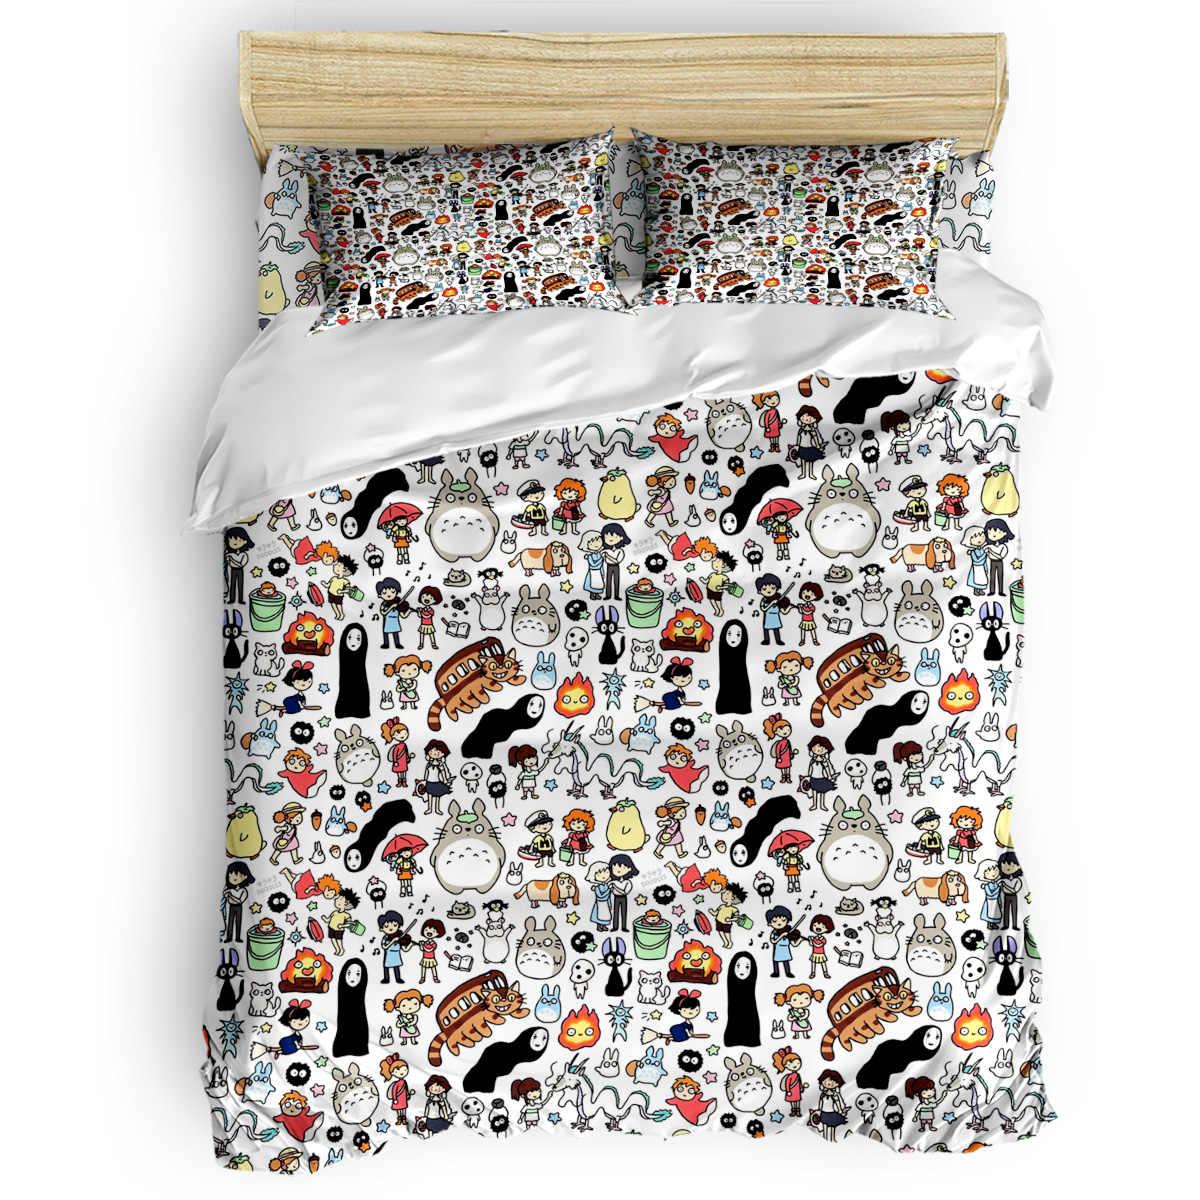 Kawaii Ghibli Doodle Duvet Cover Cotton Duvet Cover King Size Queen Size Quilt Cover Set Bedclothes Comforter Single Bedding Set Bedding Sets Aliexpress